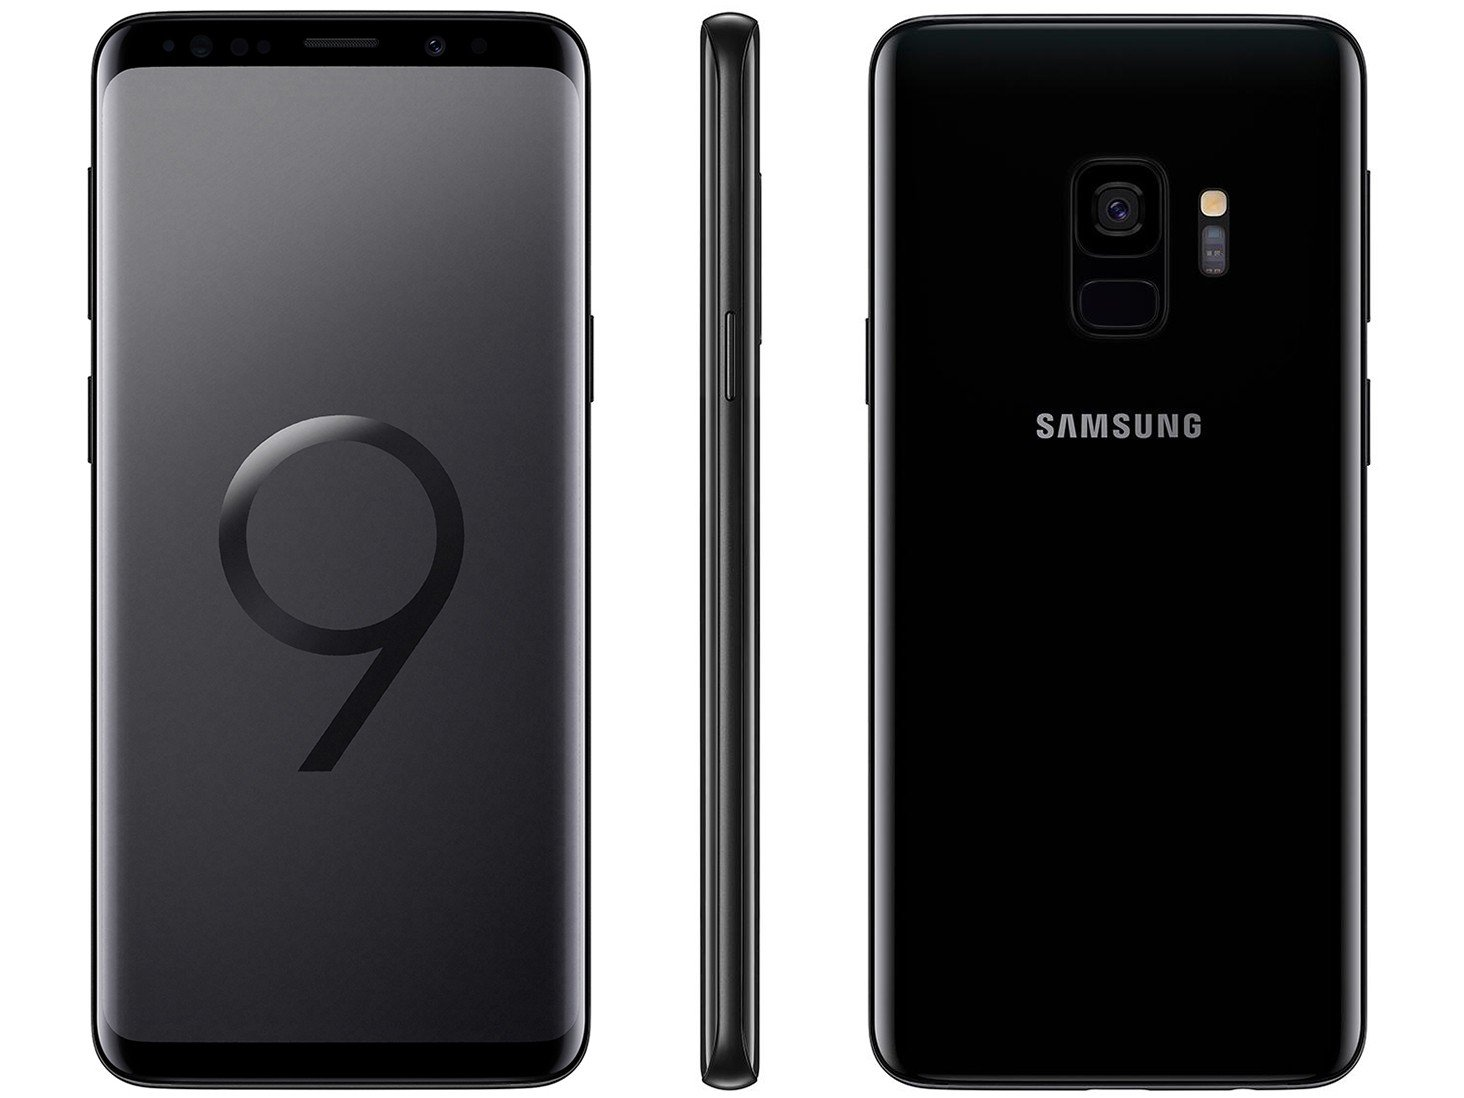 "Smartphone Samsung Galaxy S9 128GB Preto 4G - 4GB RAM Tela 5.8"" Câm. 12MP + Câm. Selfie 8MP"